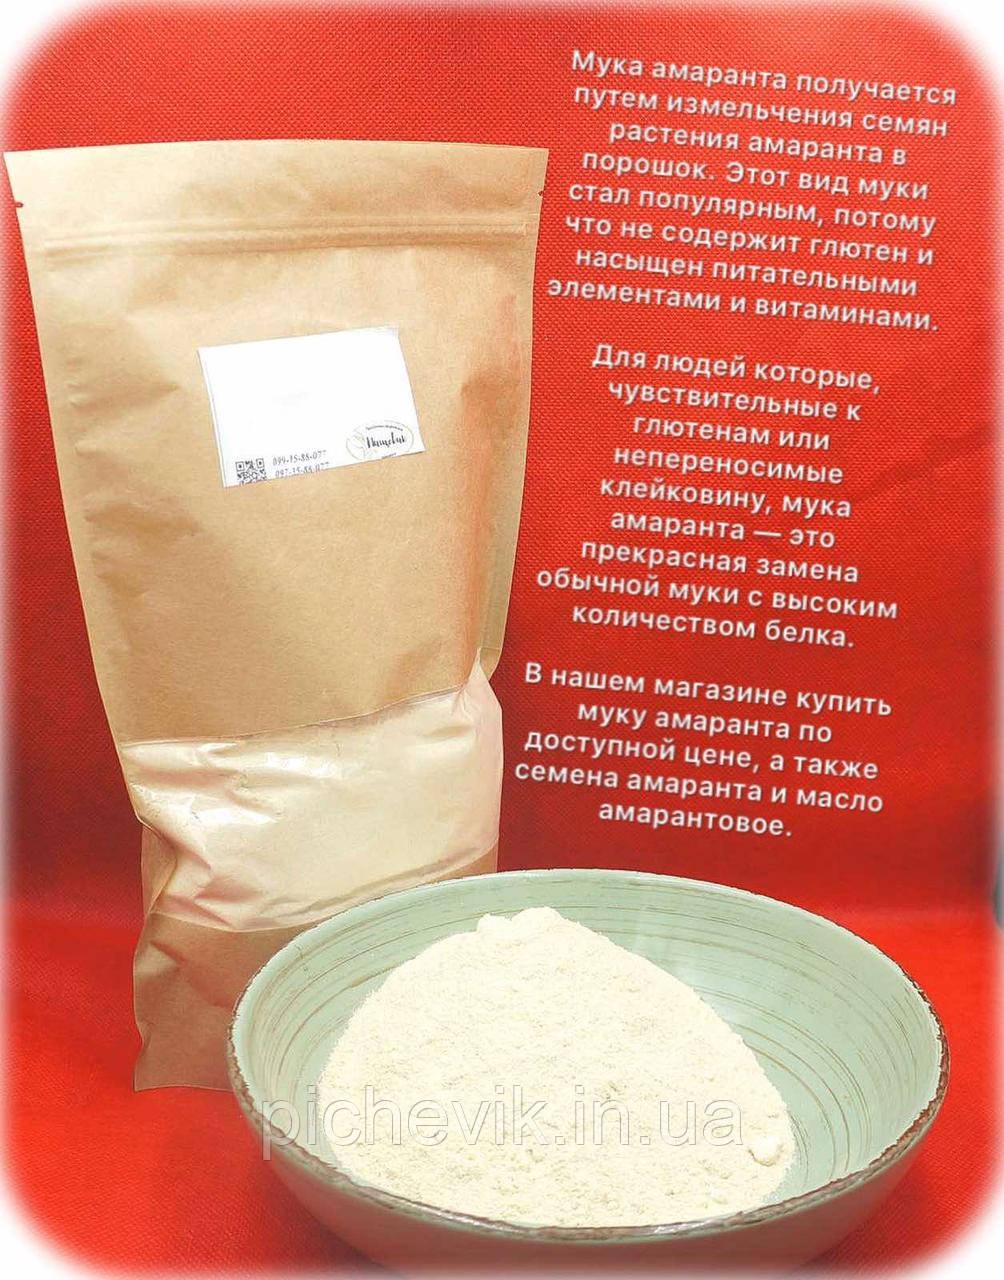 Амарантовая мука (Украина) Вес: 1 кг